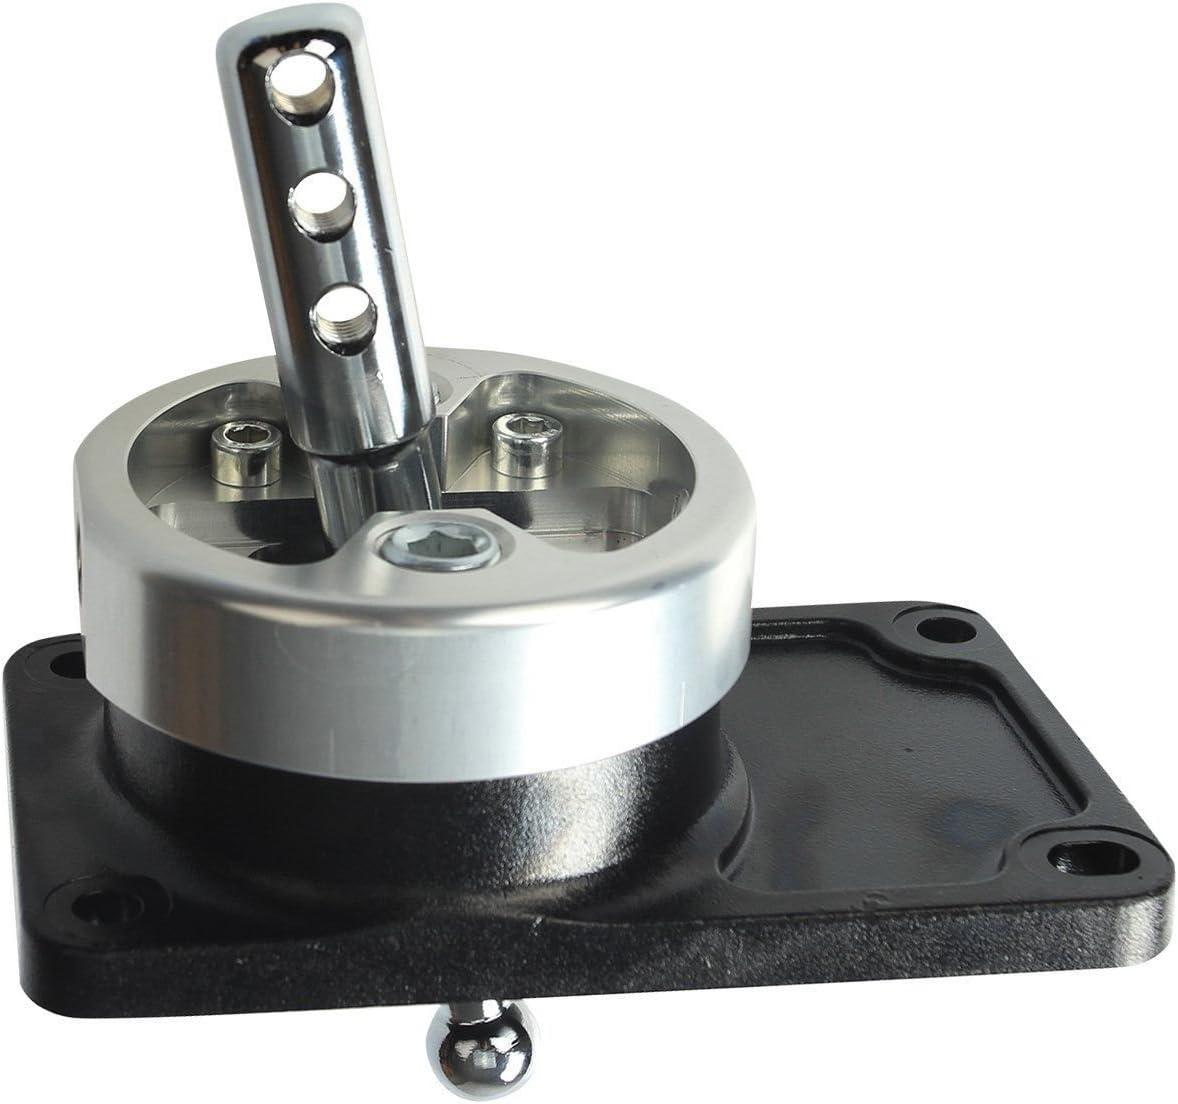 BLACKHORSE-RACING Short Throw Shifter Manual Transmission Shift ...